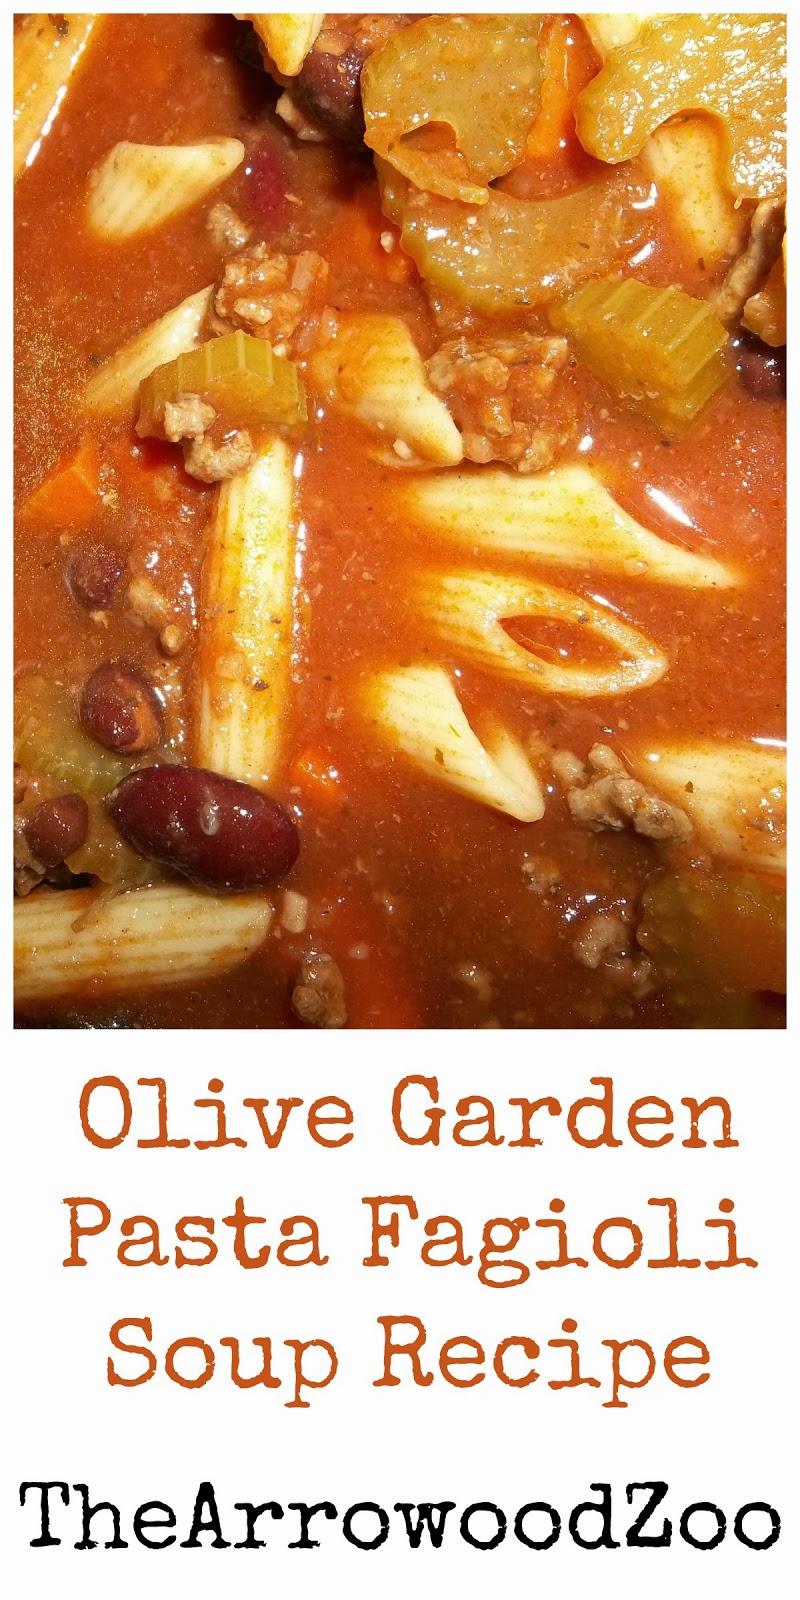 The Arrowood Zoo Olive Garden Pasta Fagioli Soup Copycat Recipe